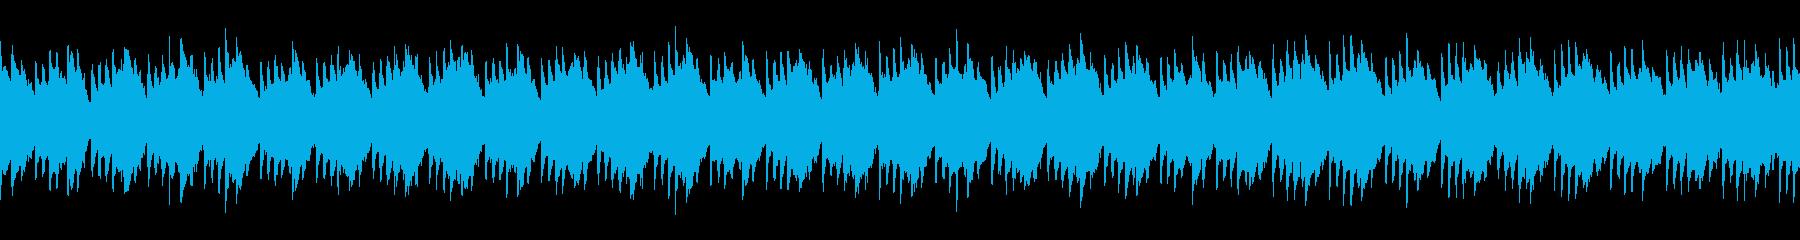 (loop)ピアノが印象的なループBGMの再生済みの波形